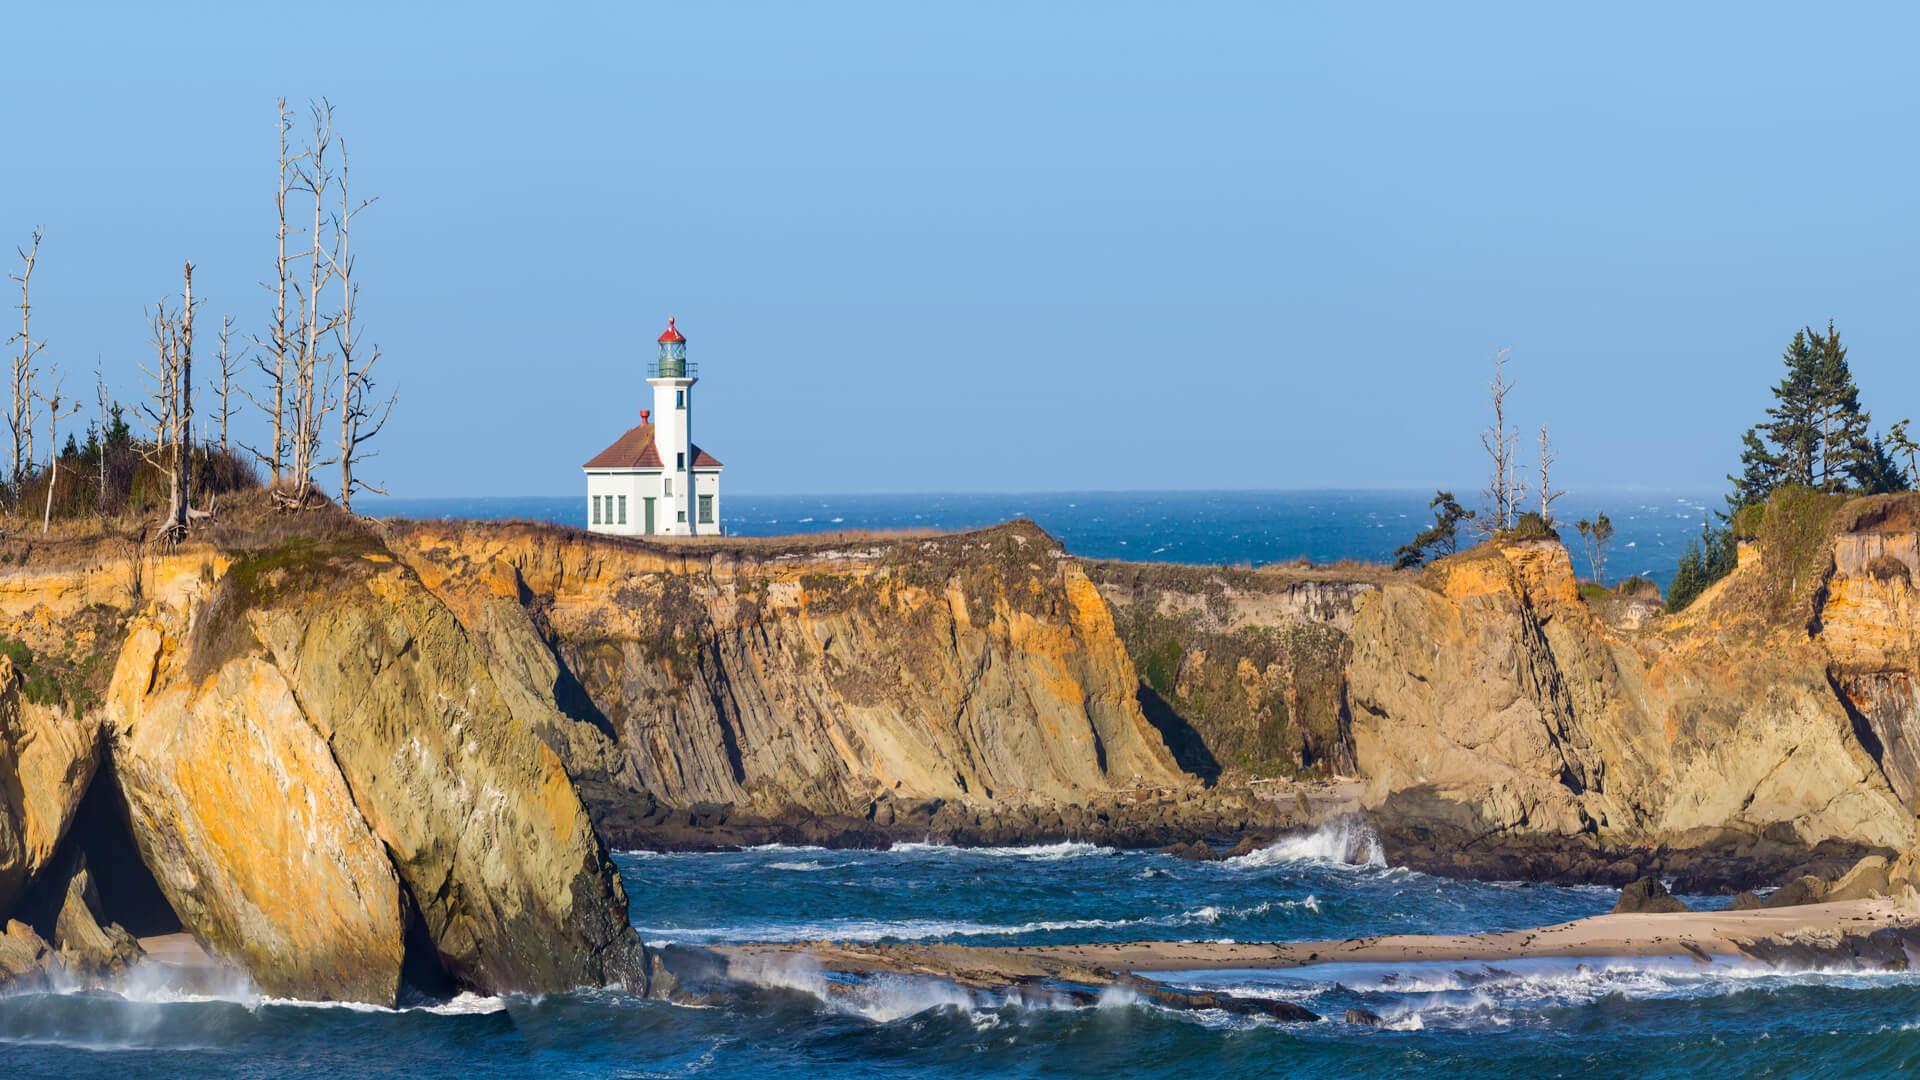 Cape Arago Lighthouse in Coos Bay Oregon